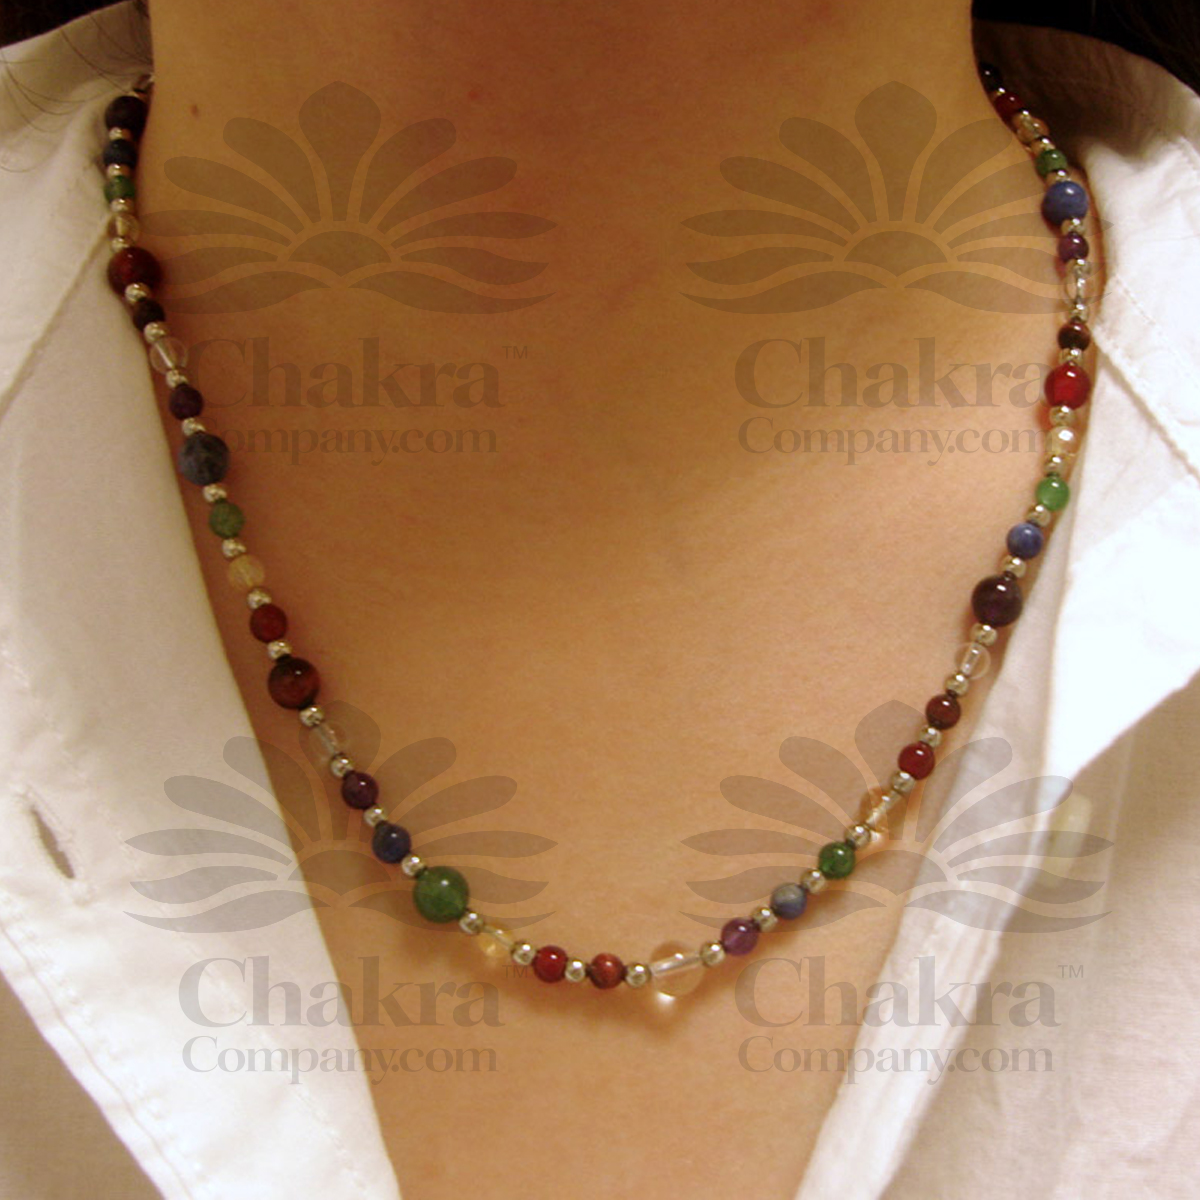 Chakra Round Necklace